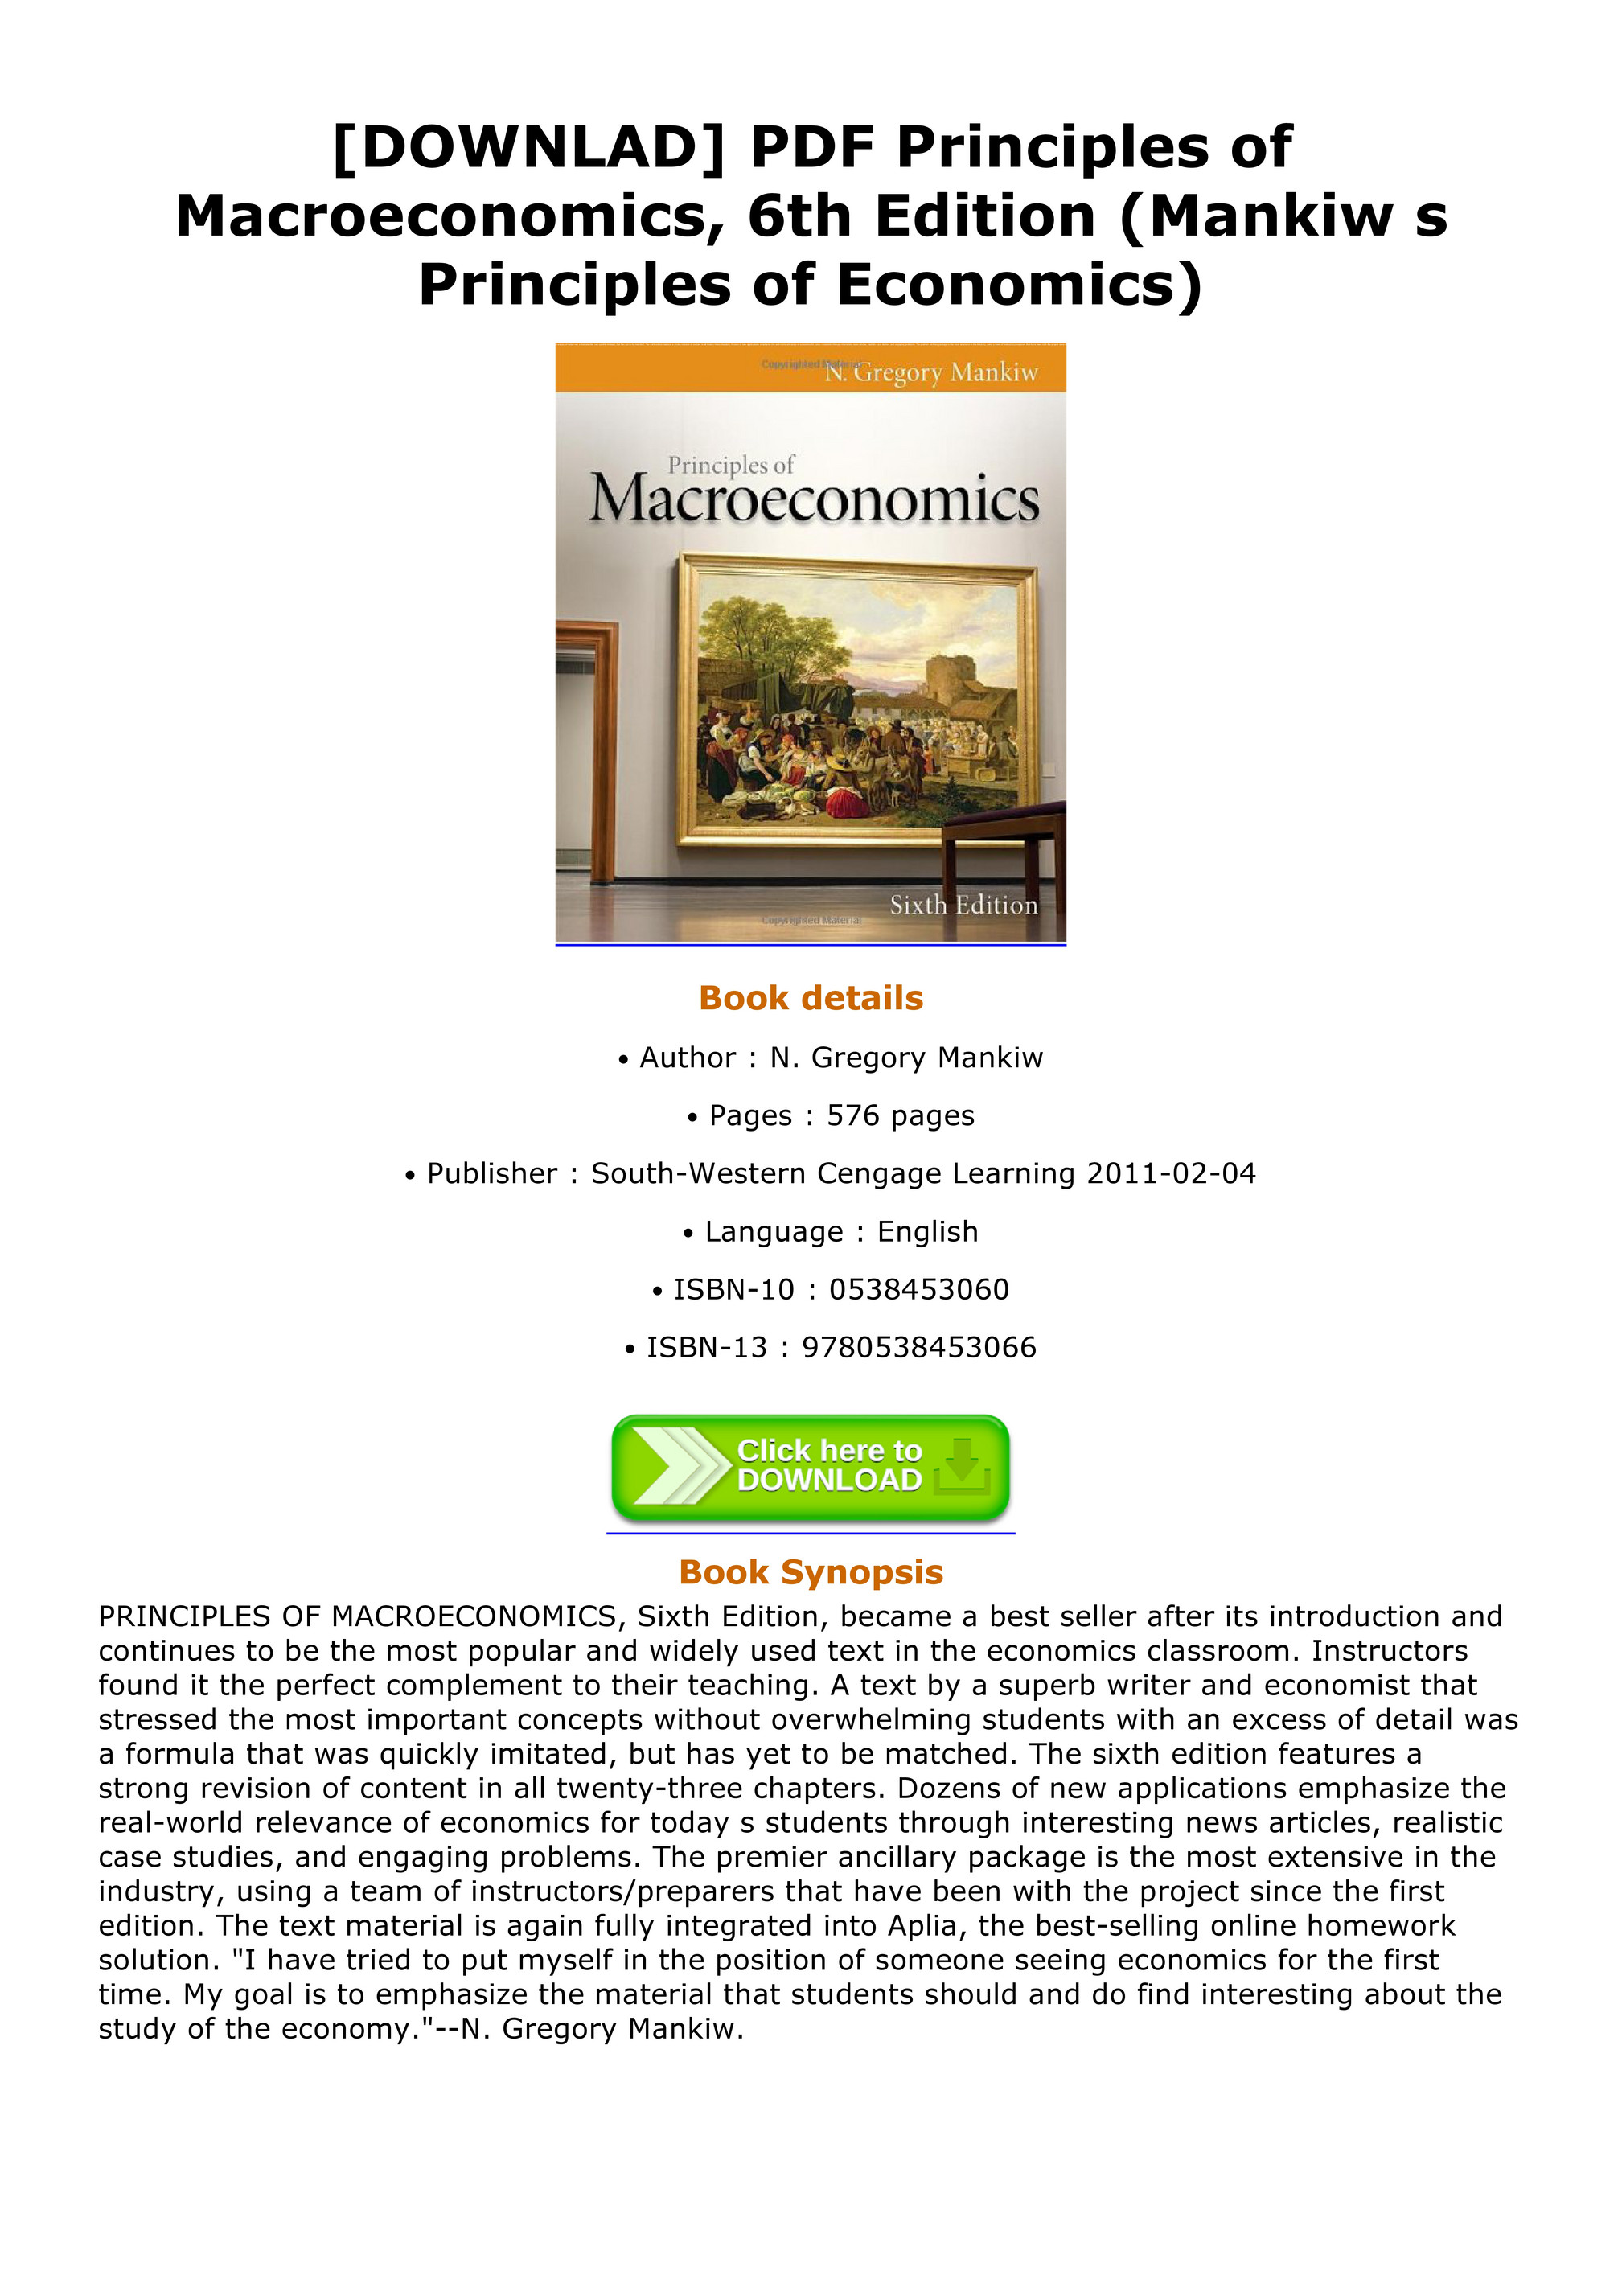 Mankiw Macroeconomics Pdf